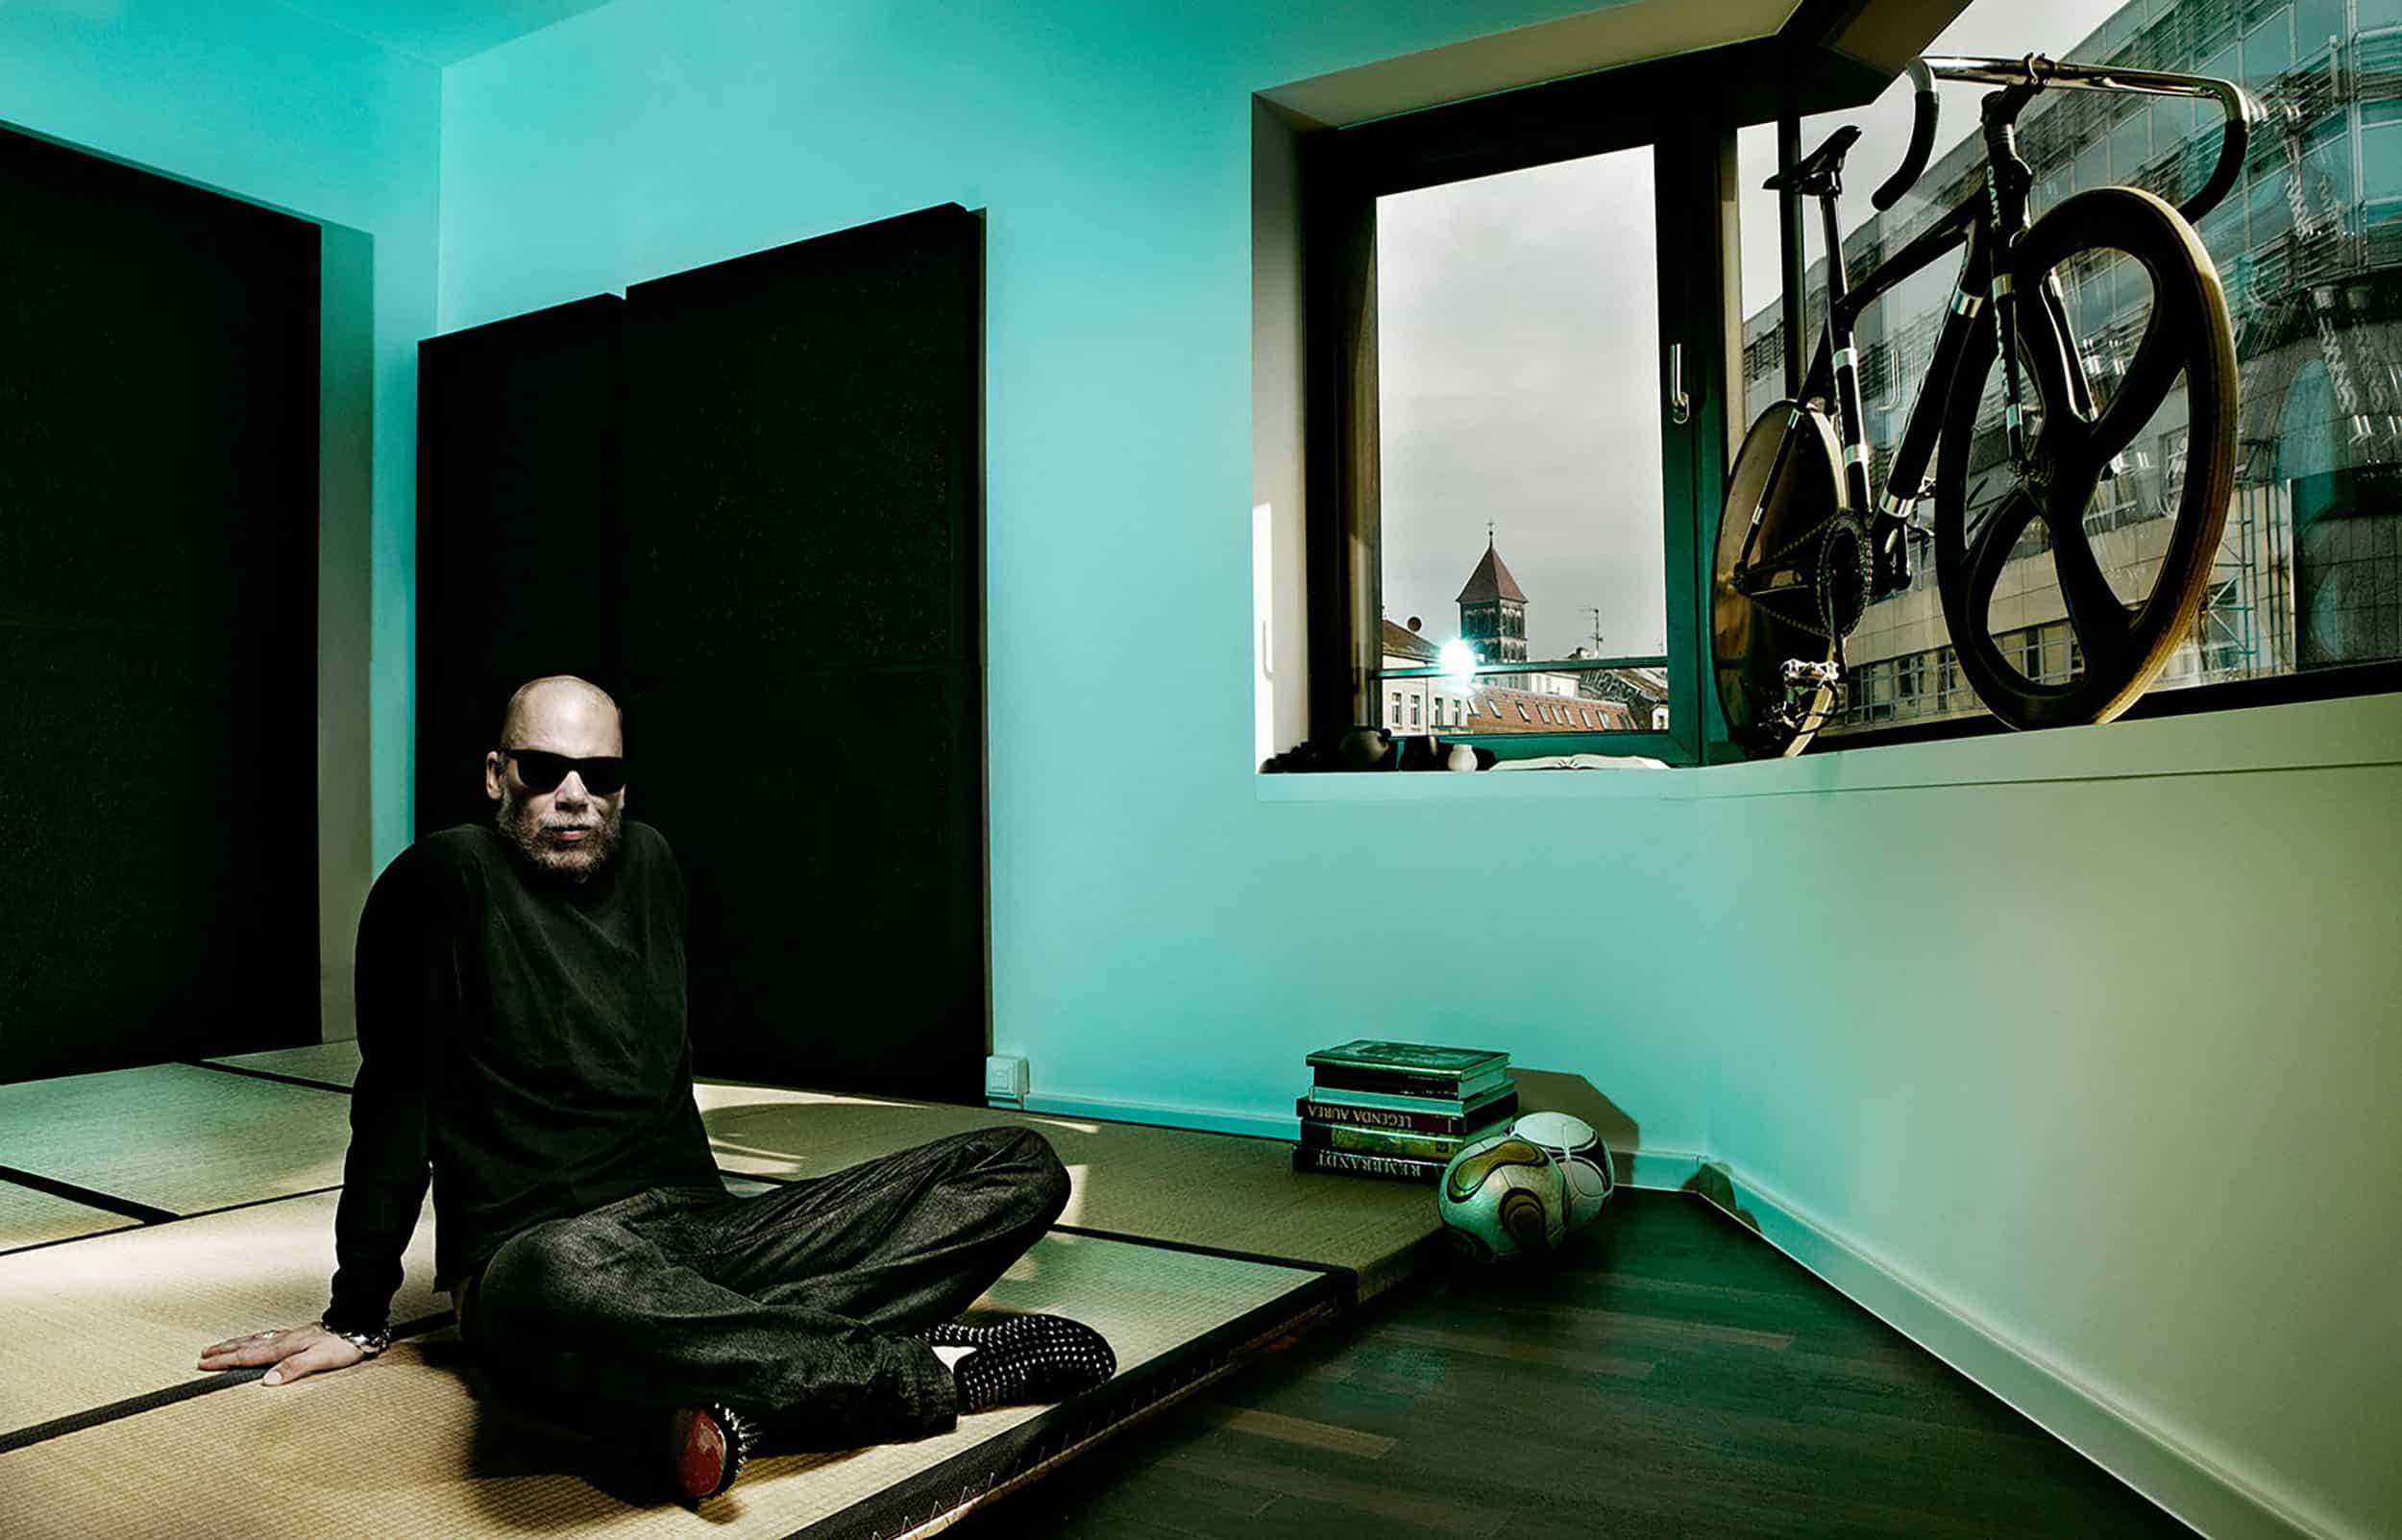 studio-ignatov-portrait-icberlin-ralph-anderl